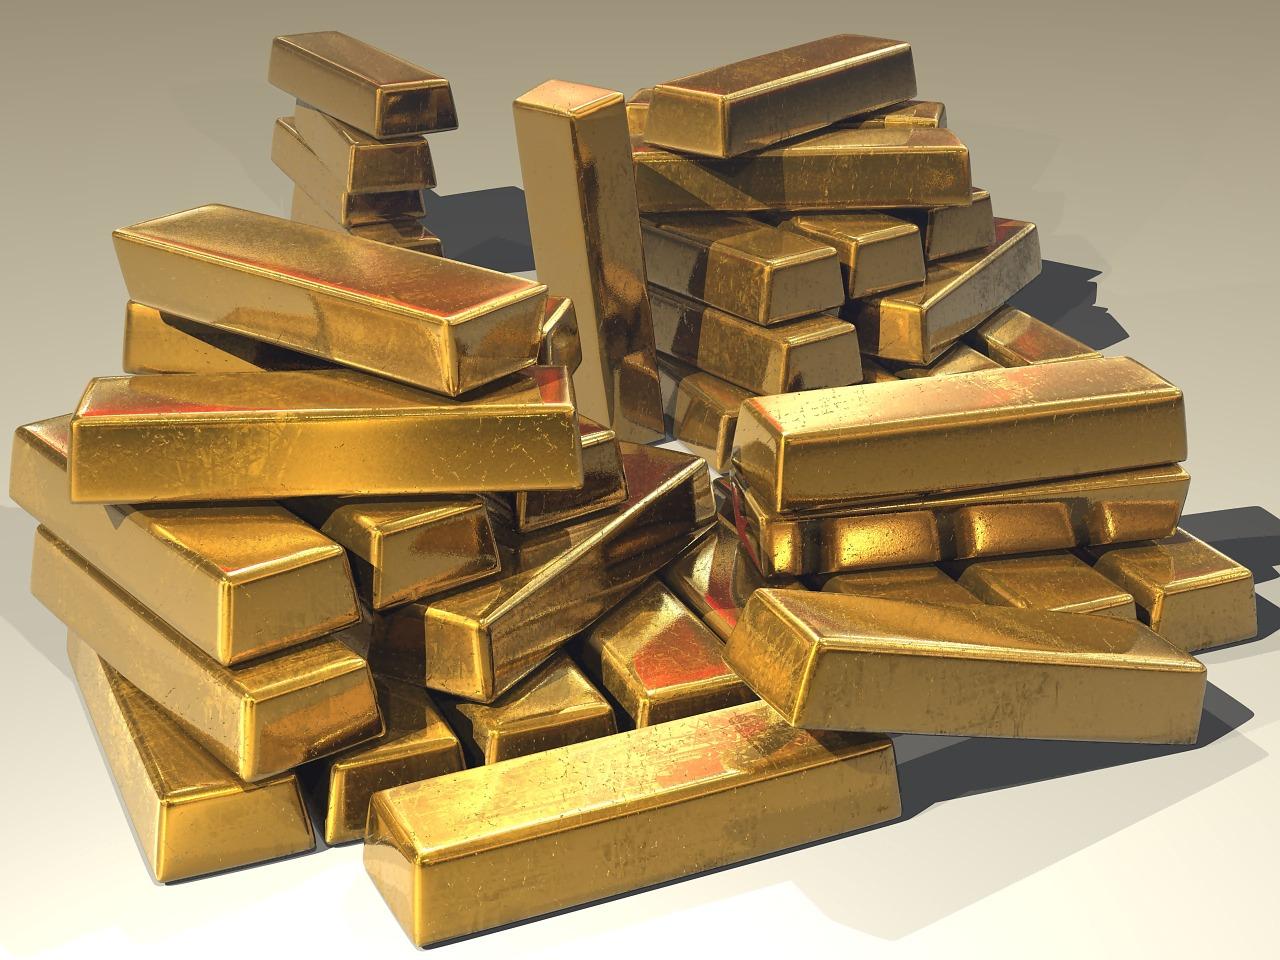 Gold precious metals fraud